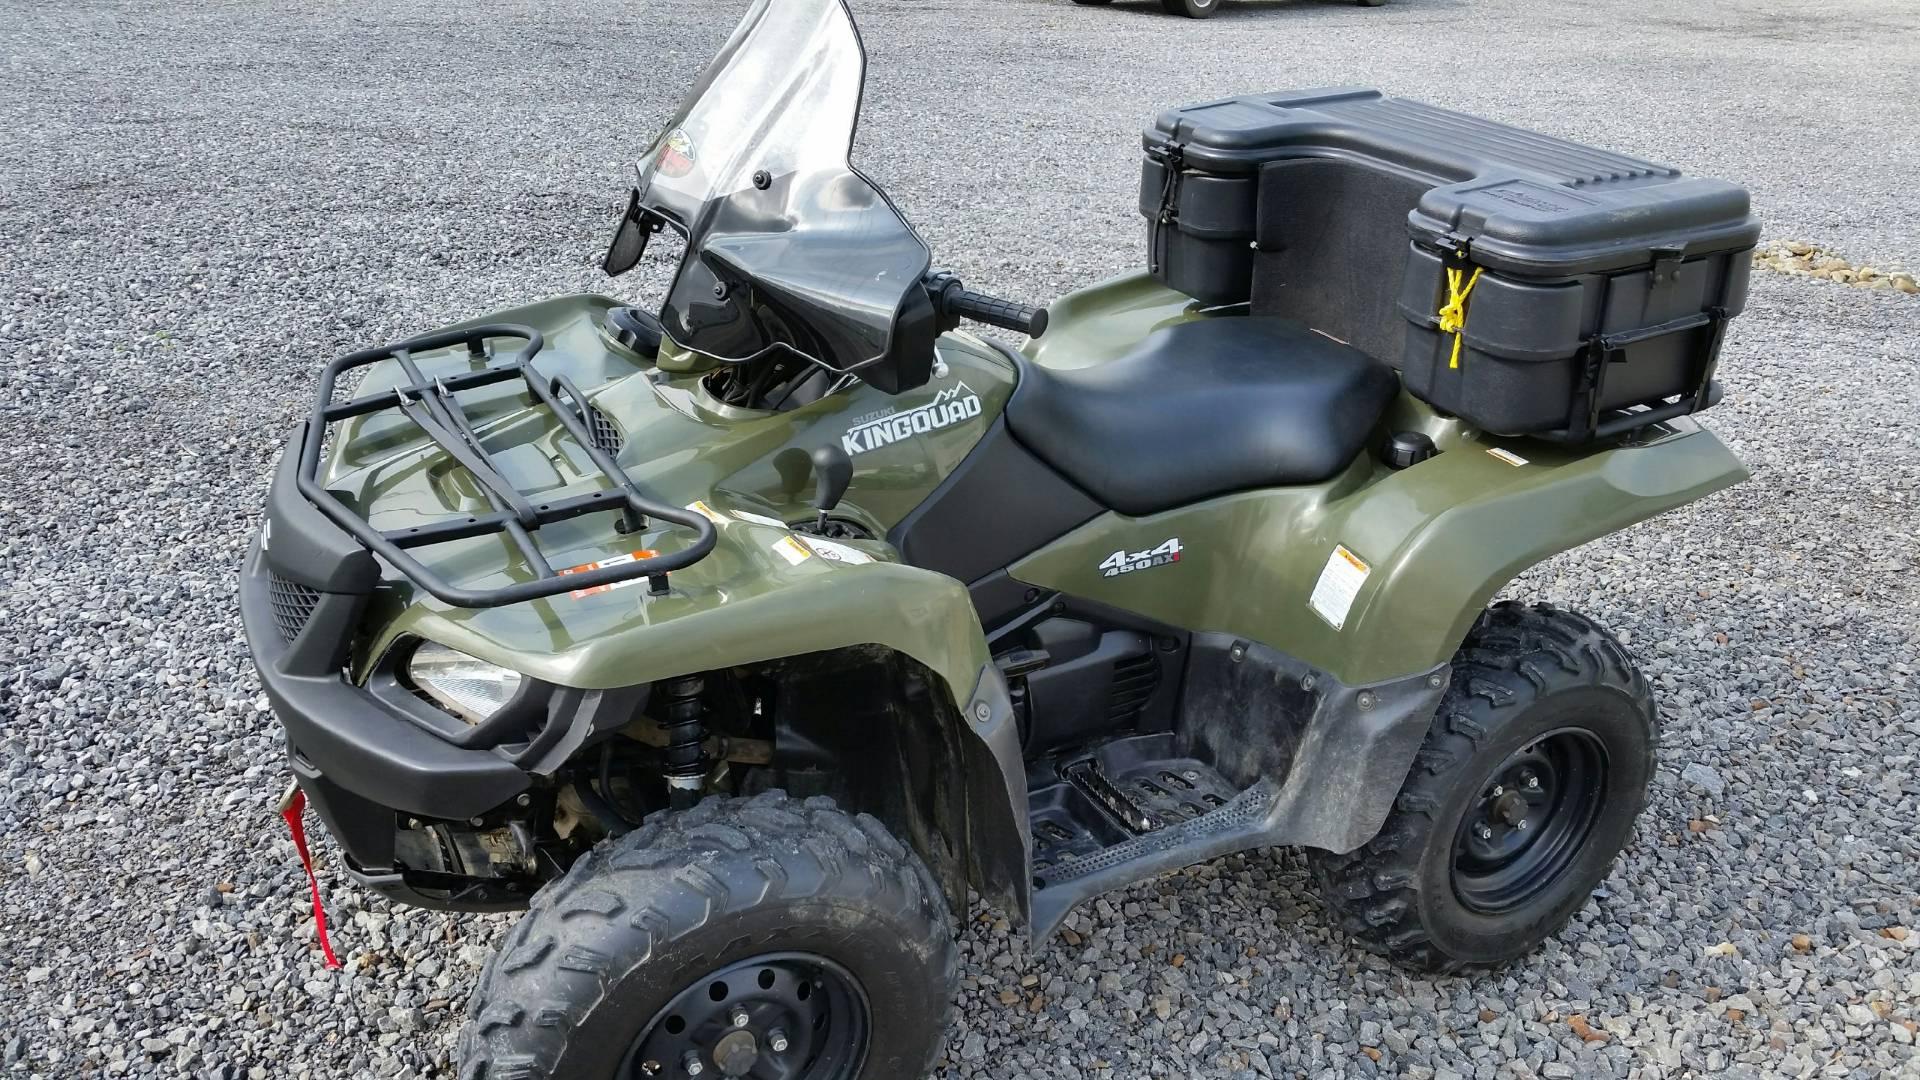 2008 Suzuki KingQuad® 450AXi 4x4 in Portersville, Pennsylvania